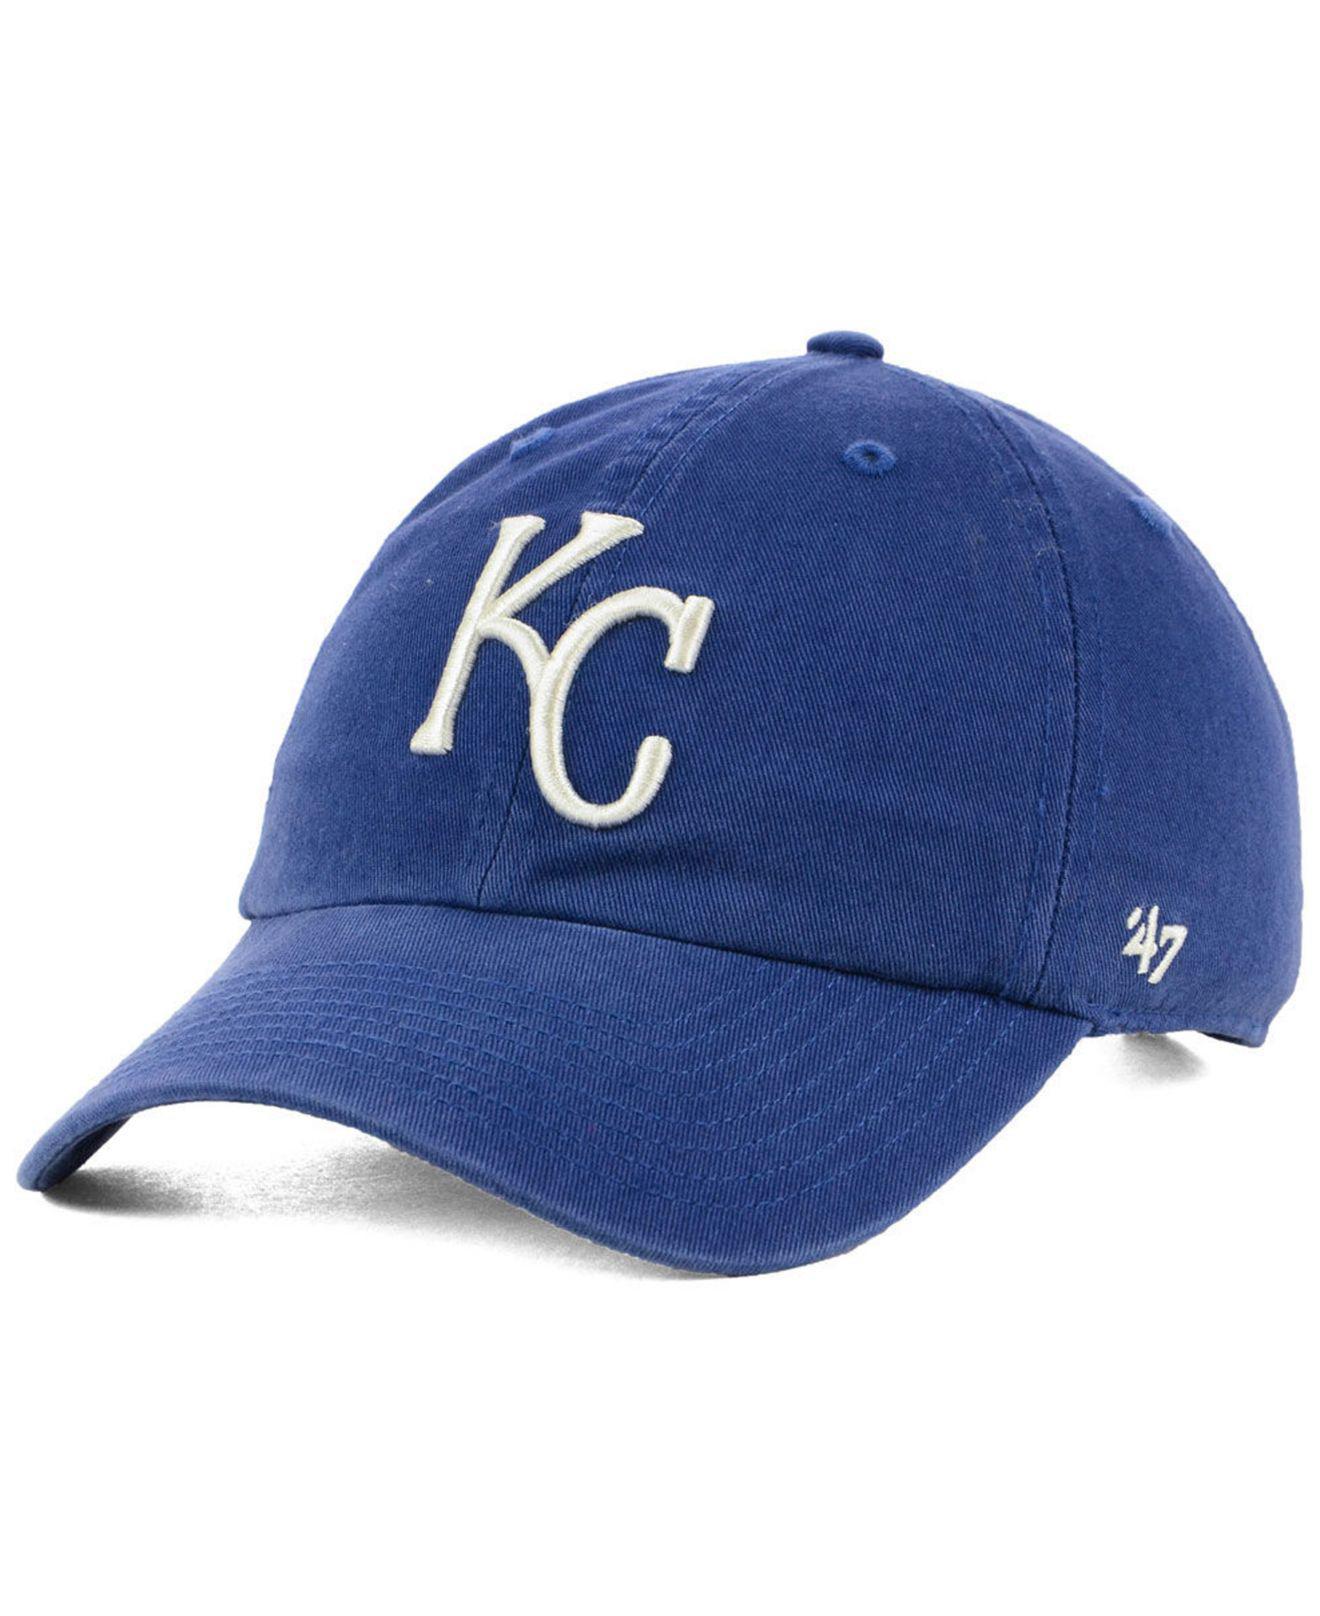 d49d8cd1366 Lyst - 47 Brand Kansas City Royals Timber Blue Clean Up Cap in Blue ...